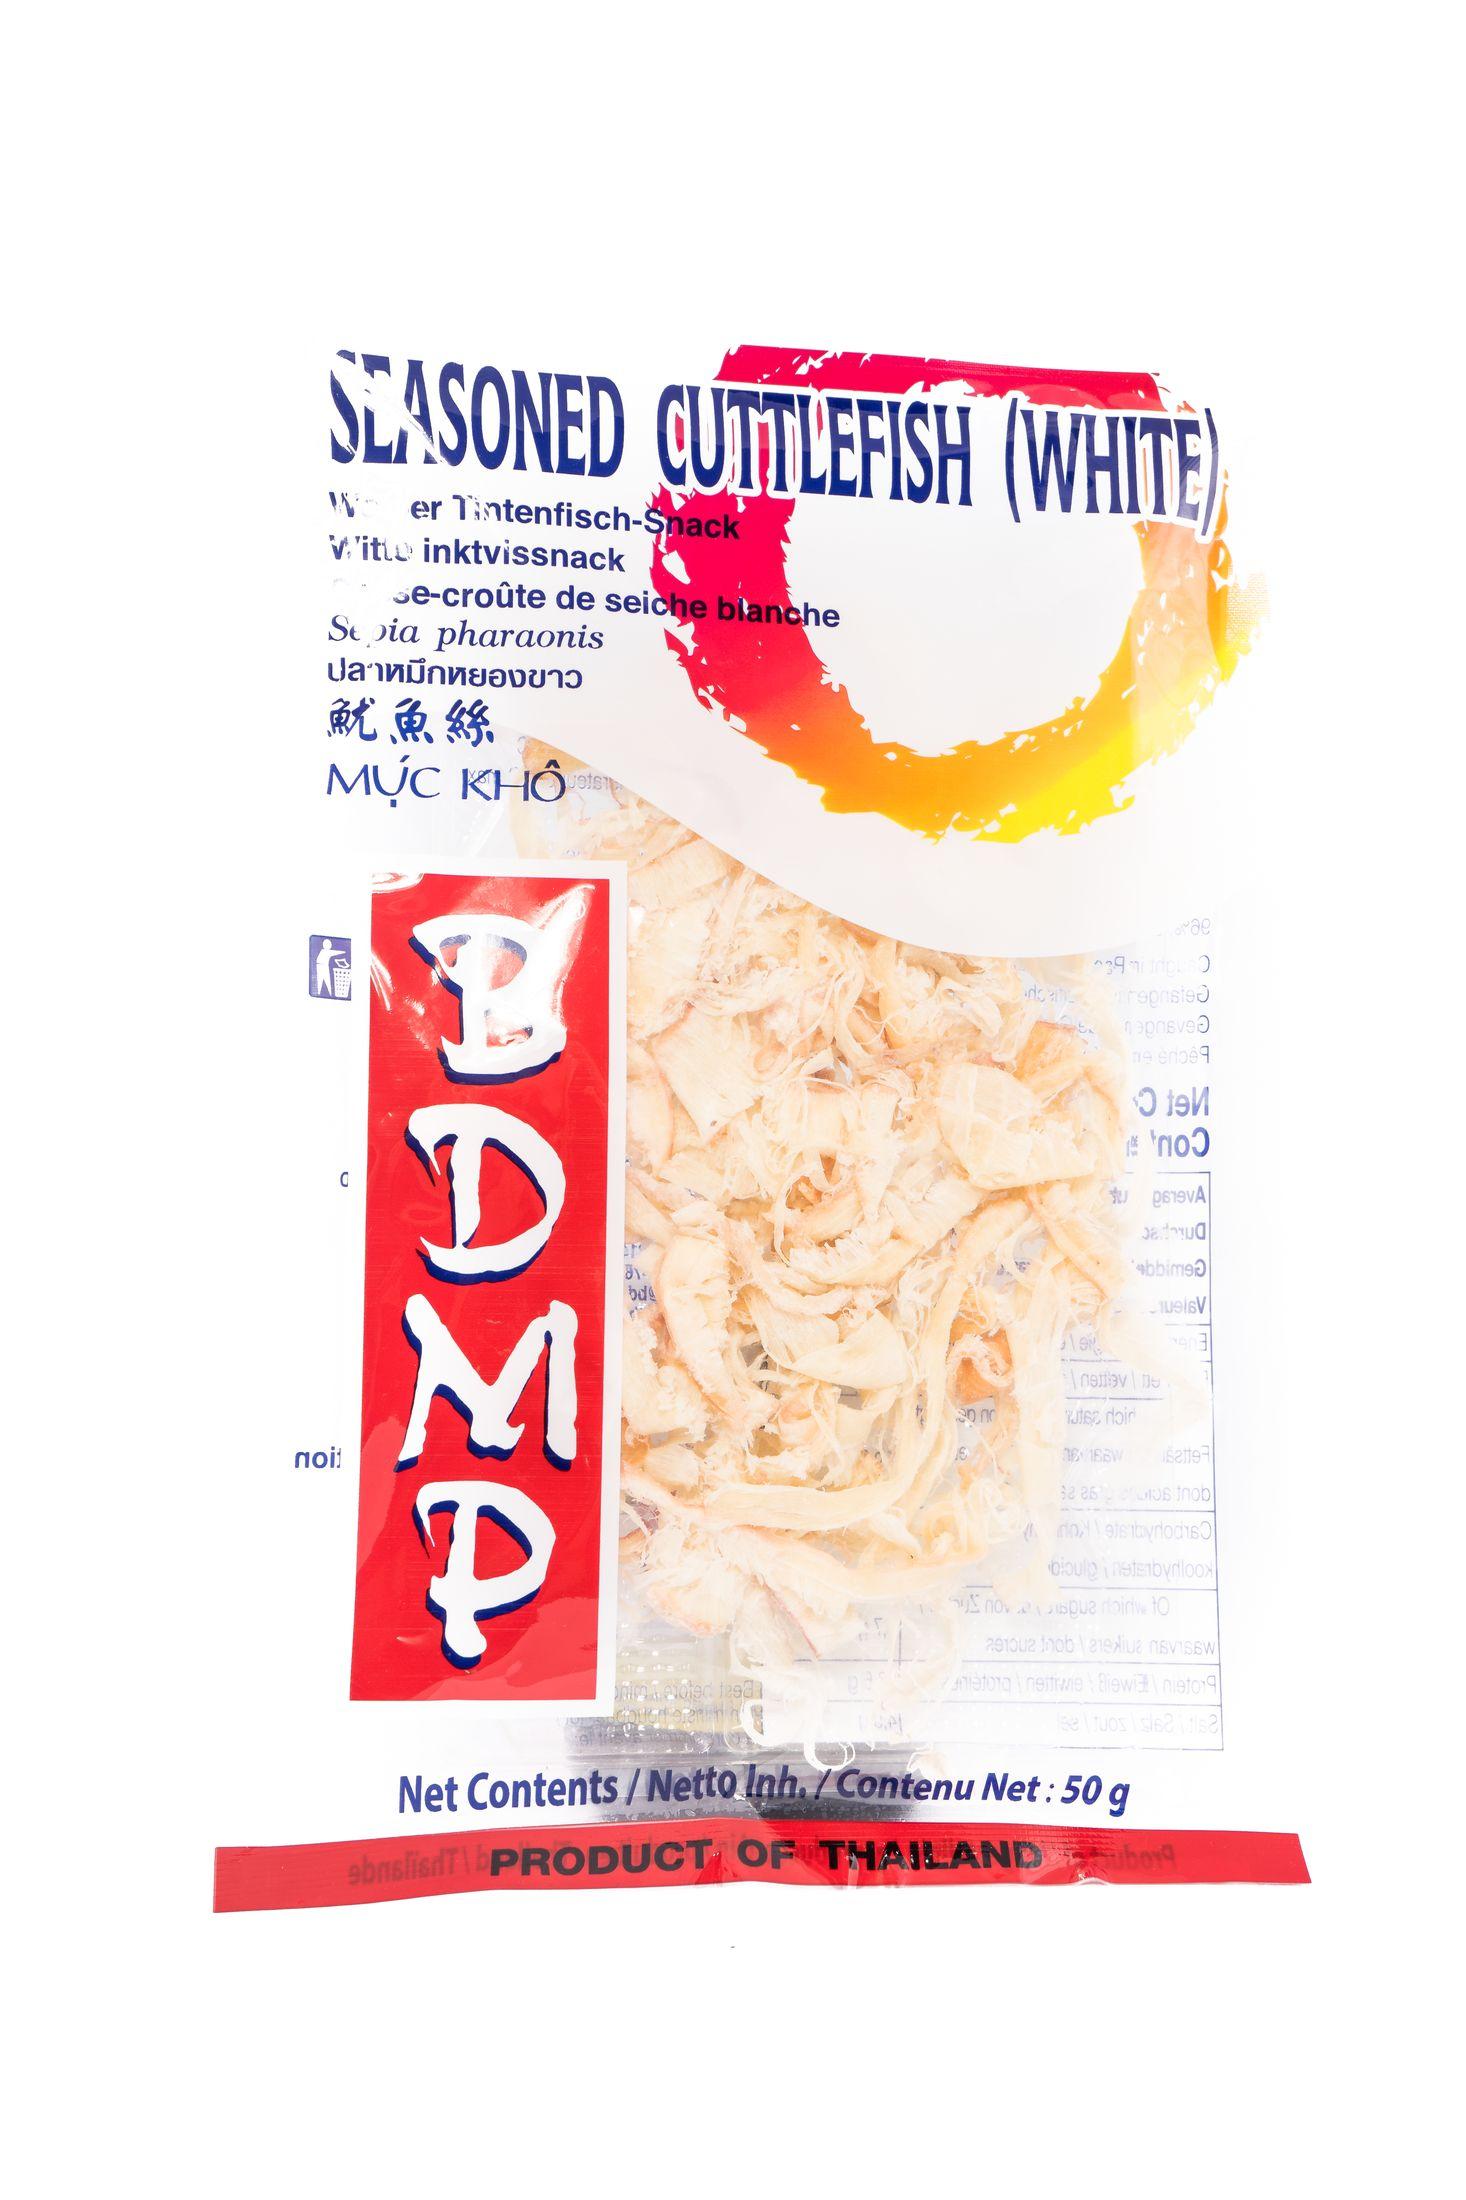 Seasoned white cuttlefish snack